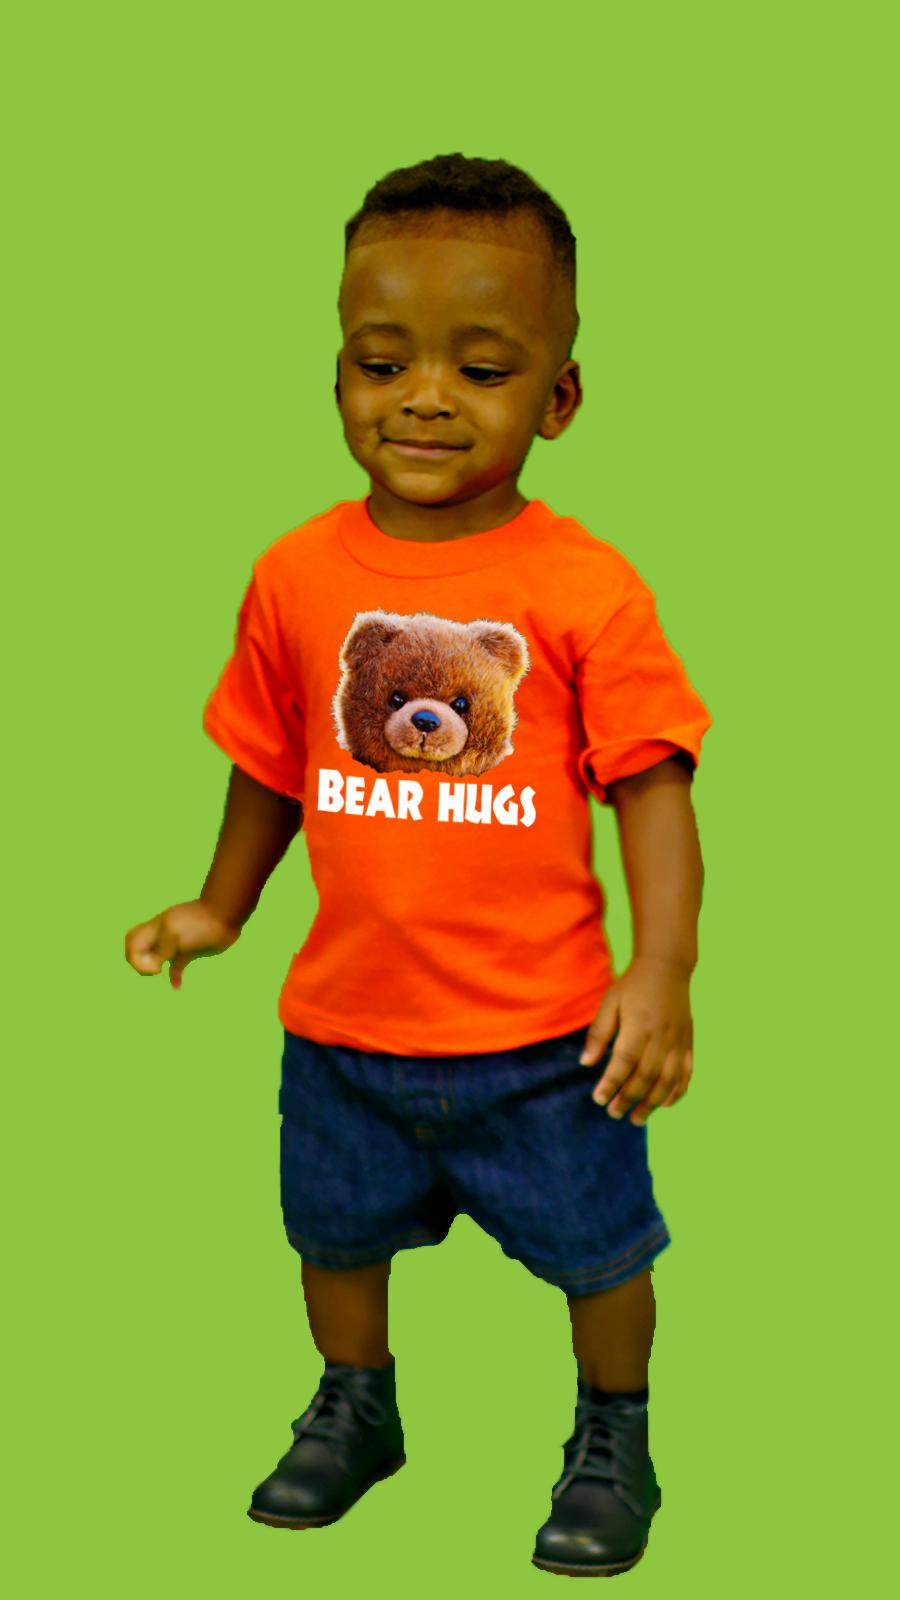 bear-hugs-orange